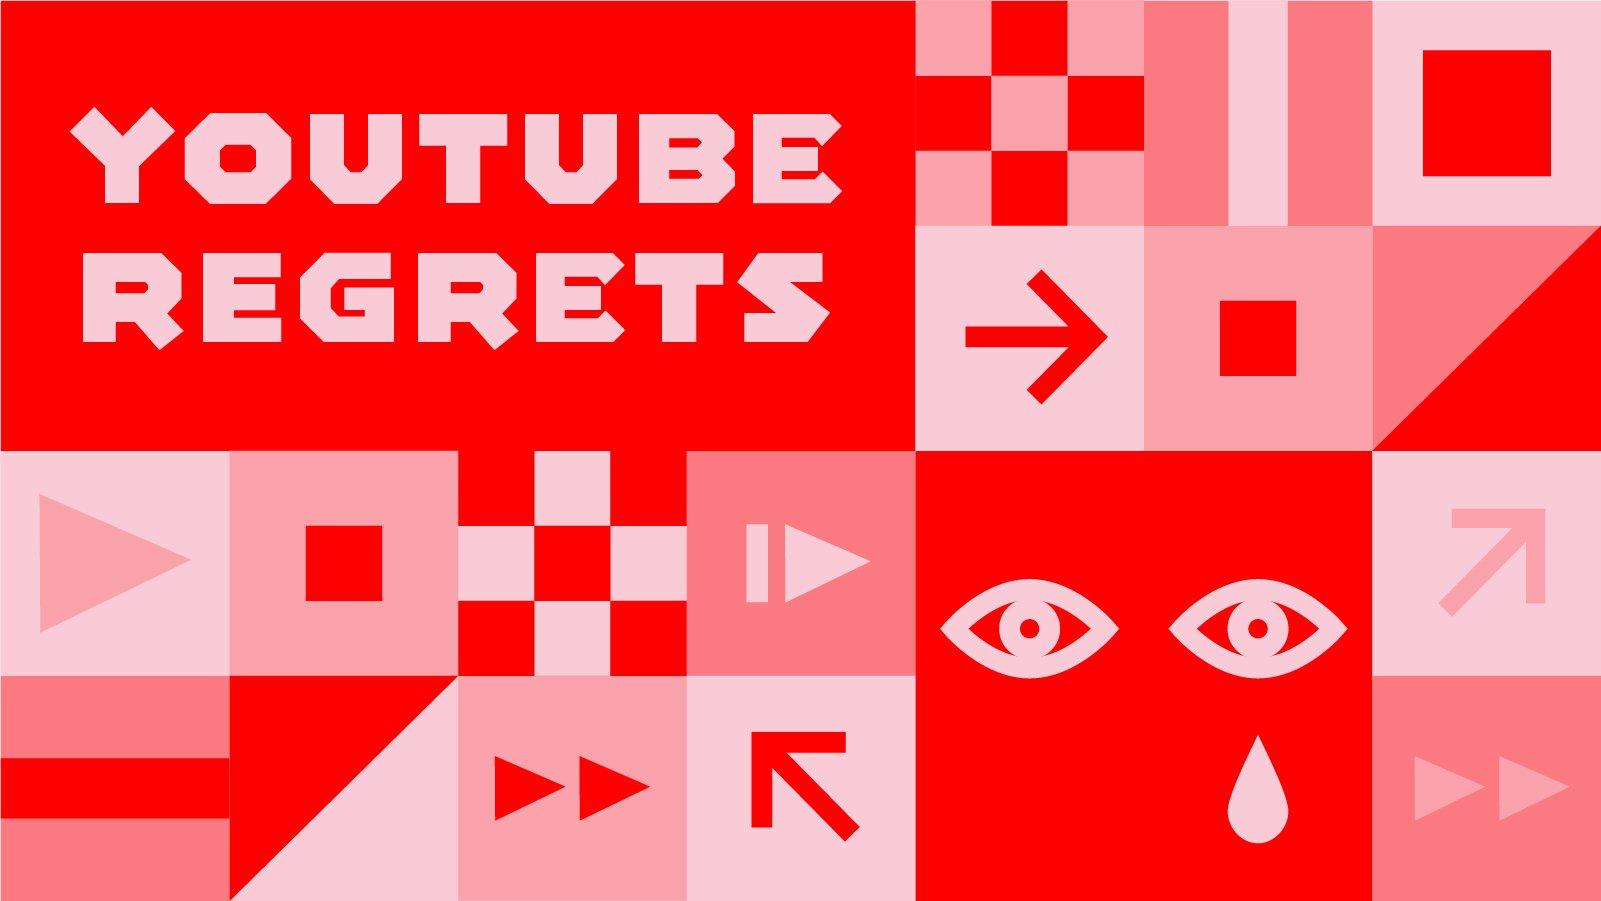 YouTube Regrets